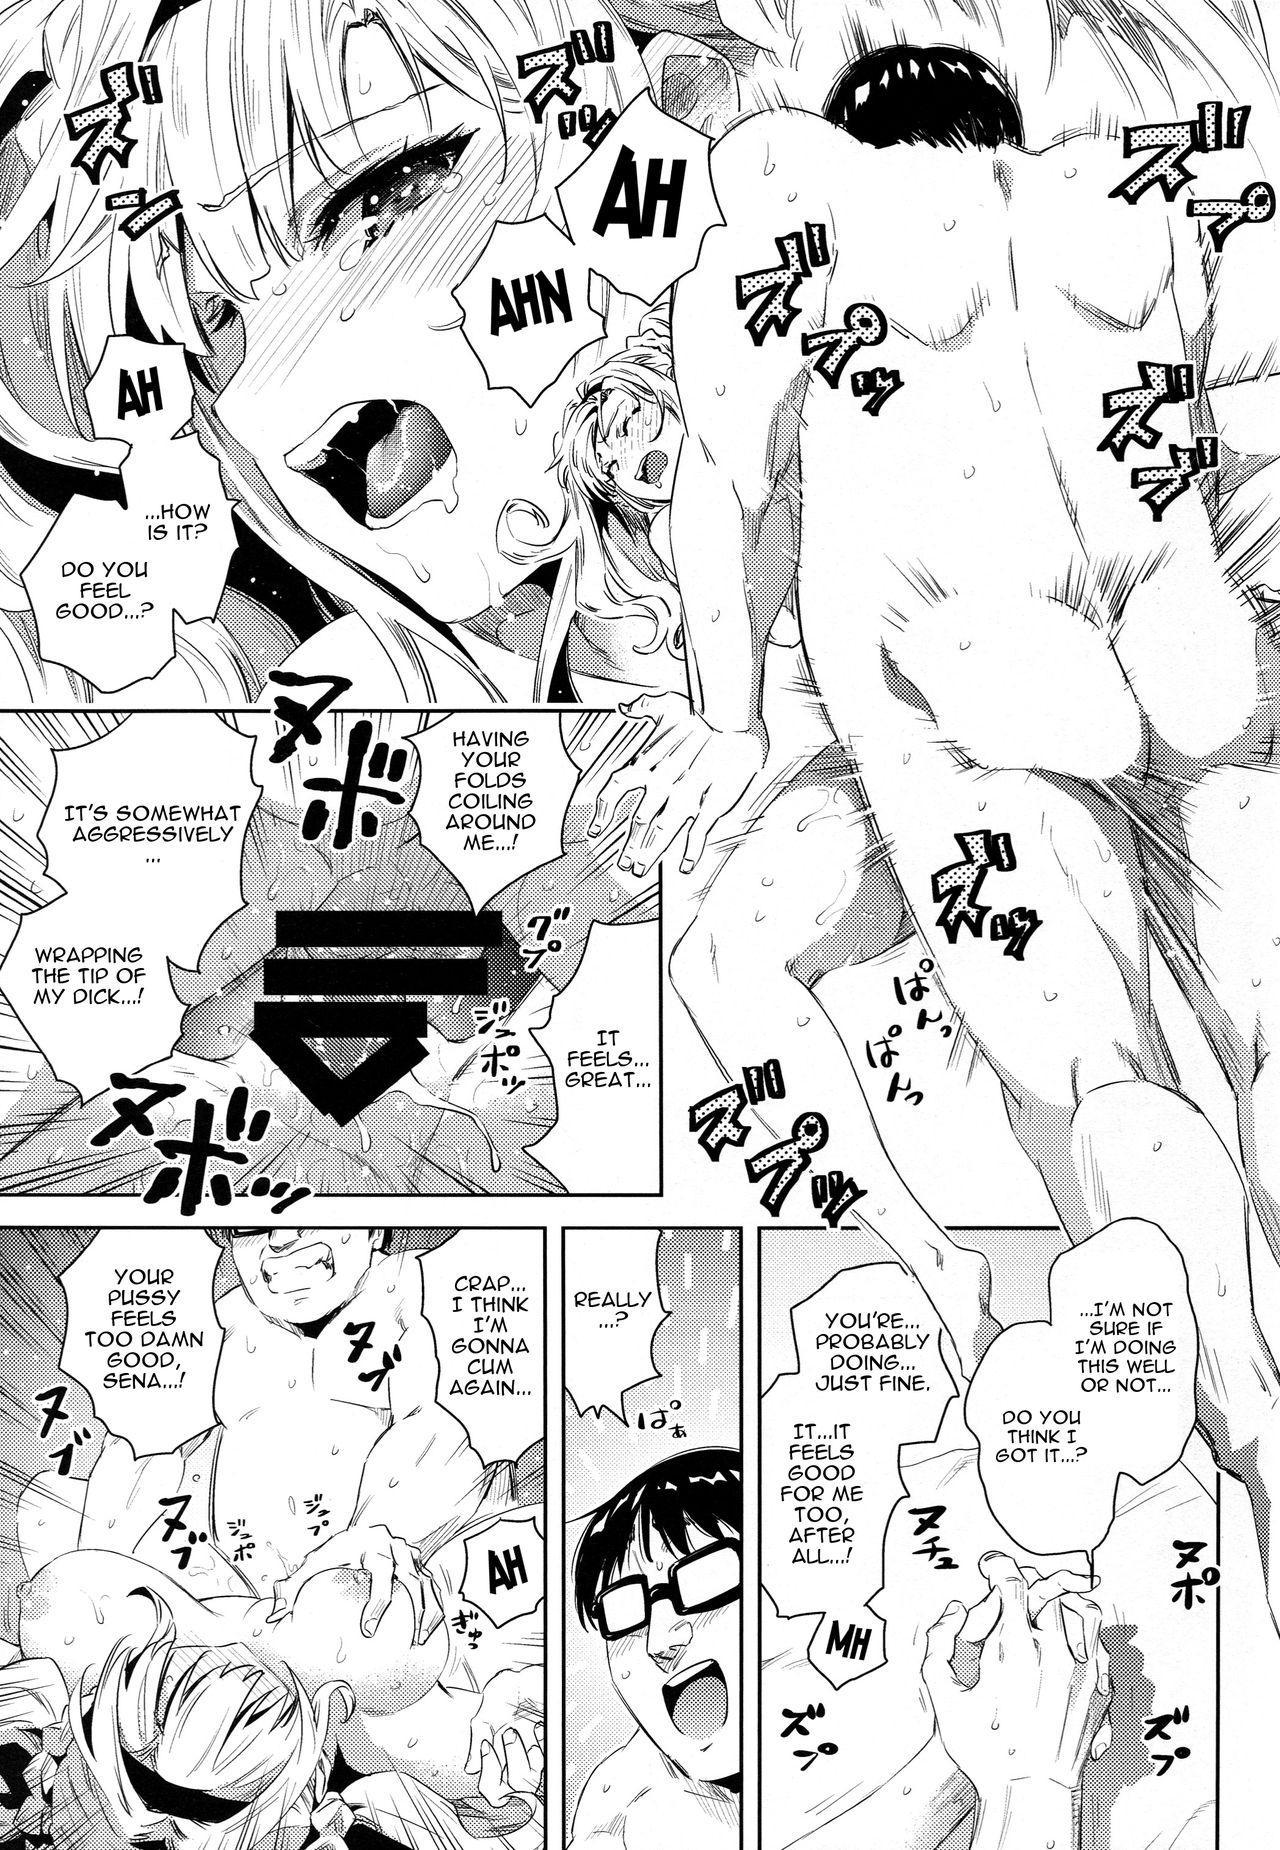 Hisashiburi ni Atta Itoko ga Hobo Zeta datta    My Cousin That I Haven't Seen in a While Was Pretty Much Like Zeta 19